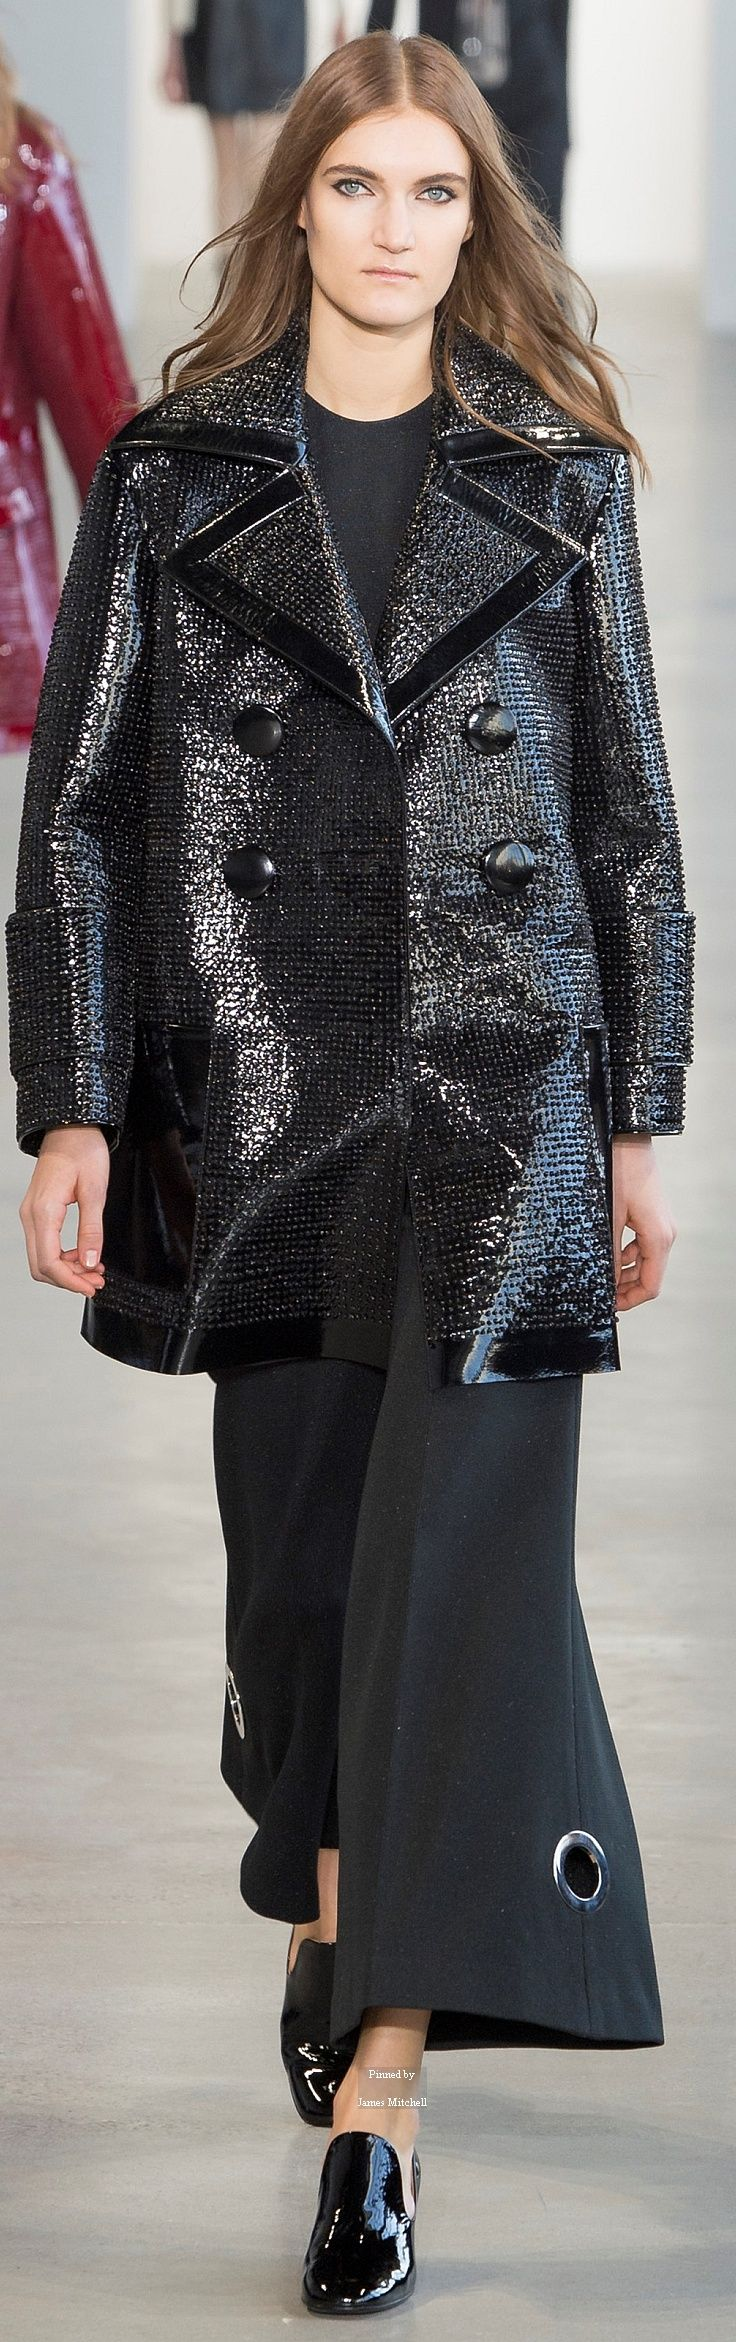 Calvin Klein Collection Collections Fall Winter 2015-16 collection